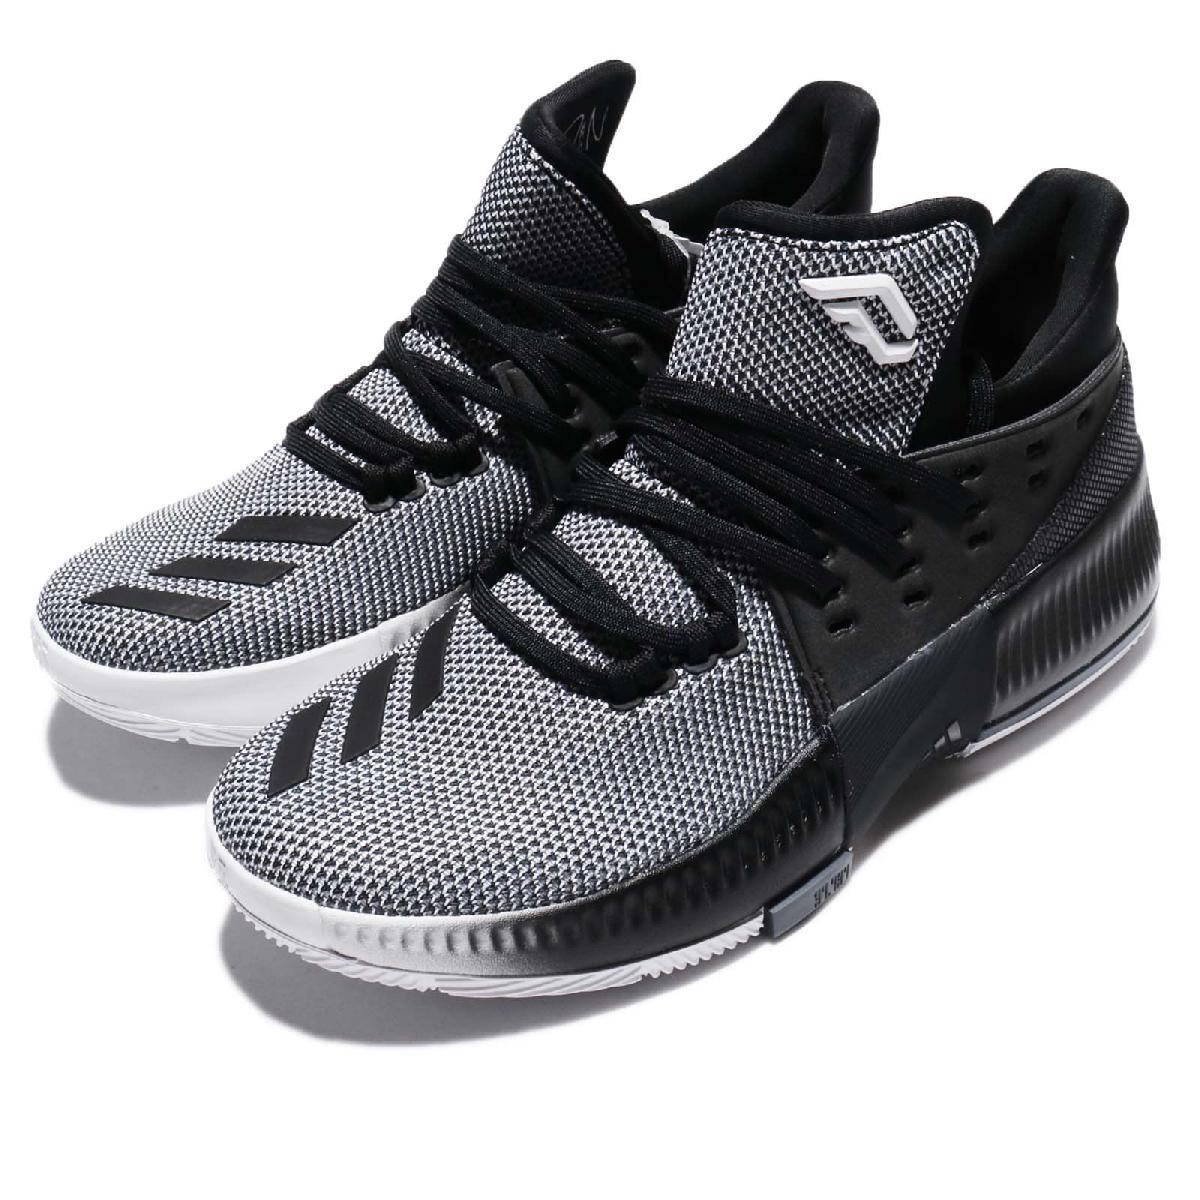 adidas籃球鞋Dame 3 J黑白漸層Damian Lillard女鞋大童鞋PUMP306 CG4228